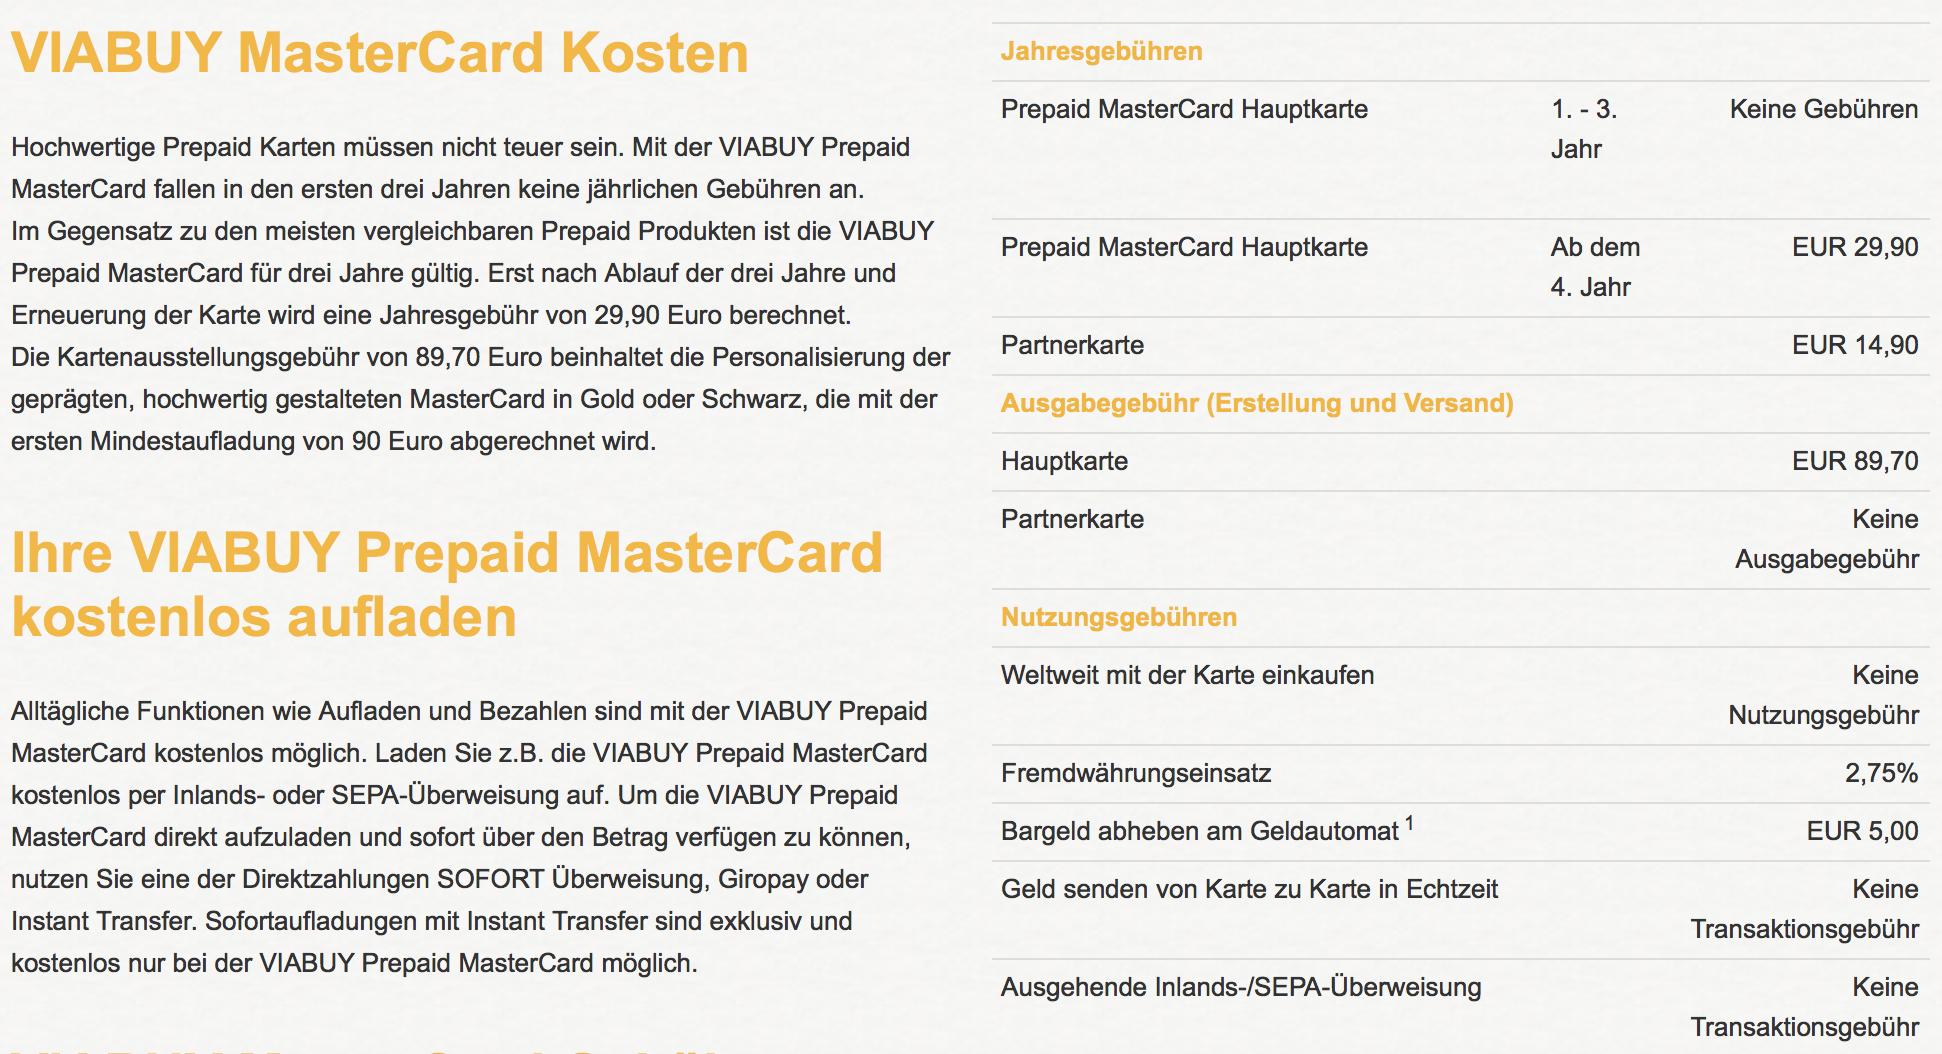 VIABUY MasterCard Kostenübersicht